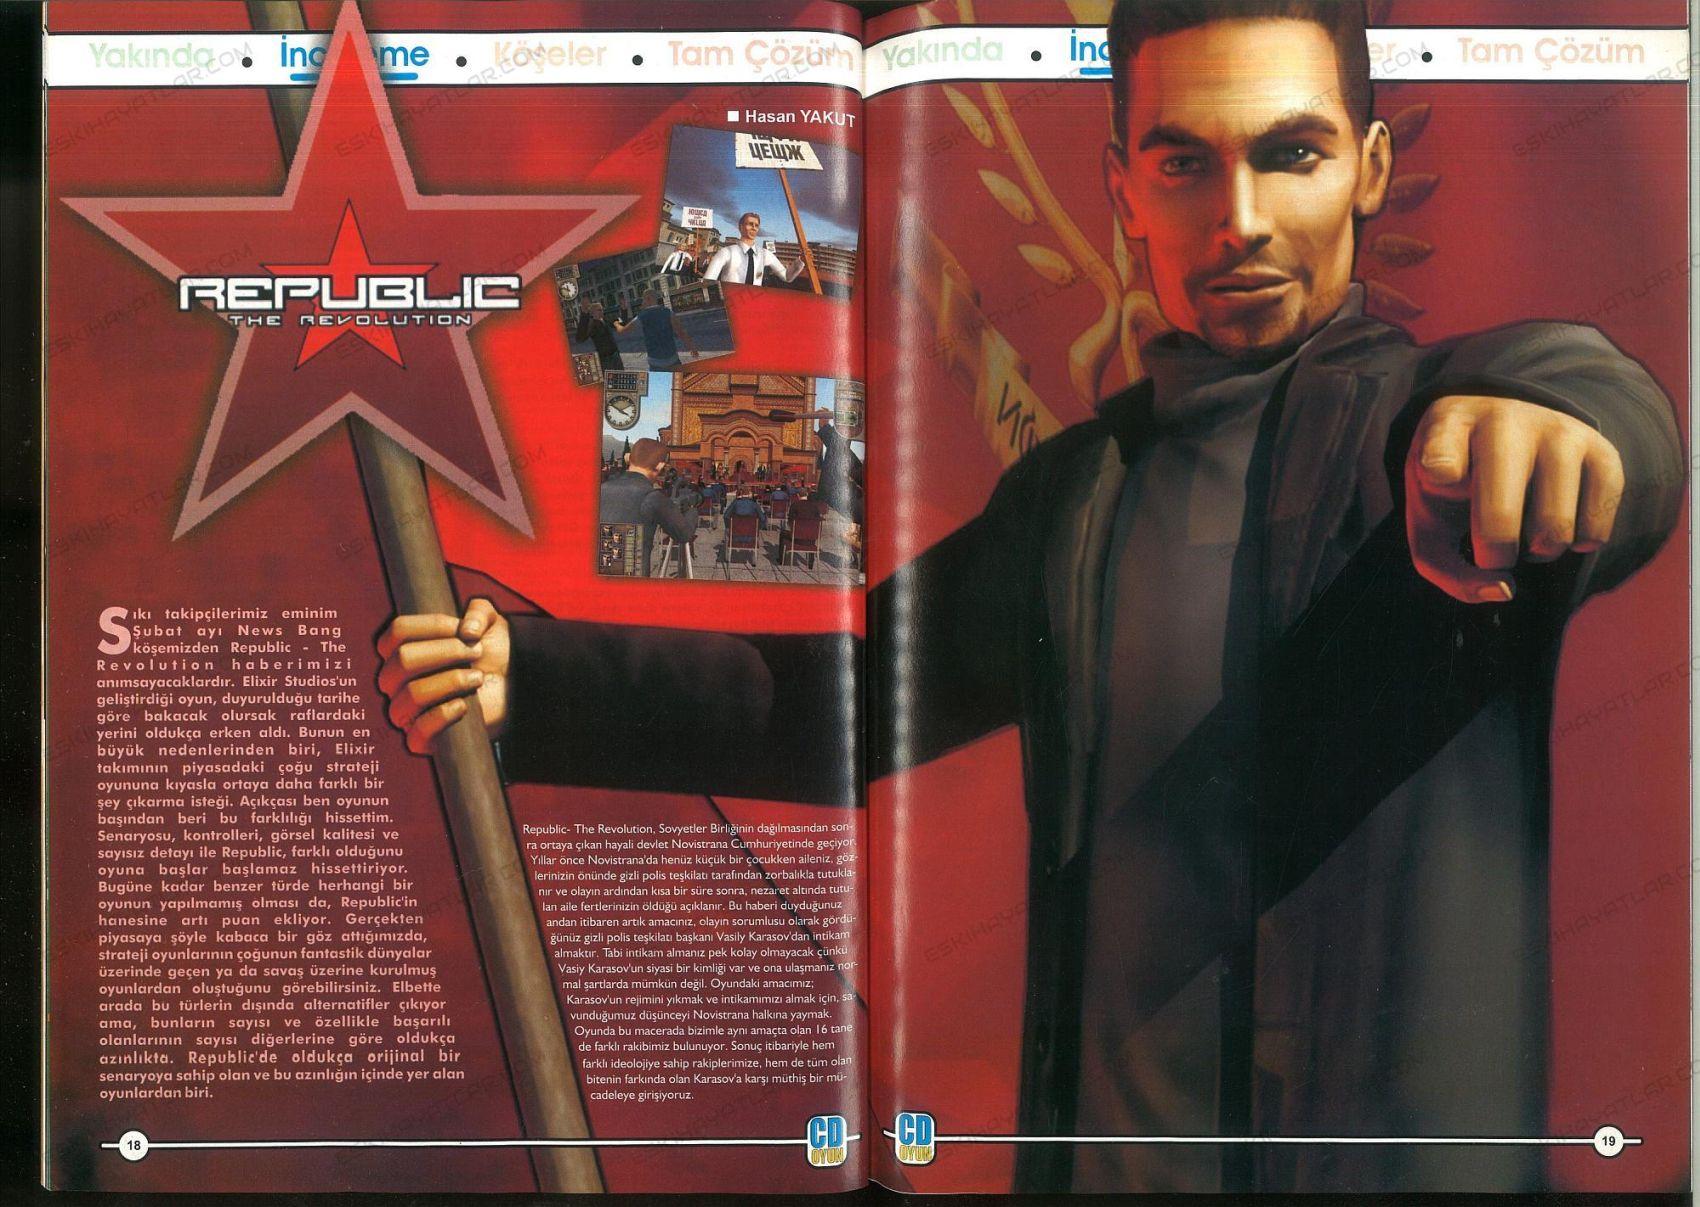 0278-republic-of-revolotion-oyun-incelemesi-2004-cd-oyun-dergisi (2)